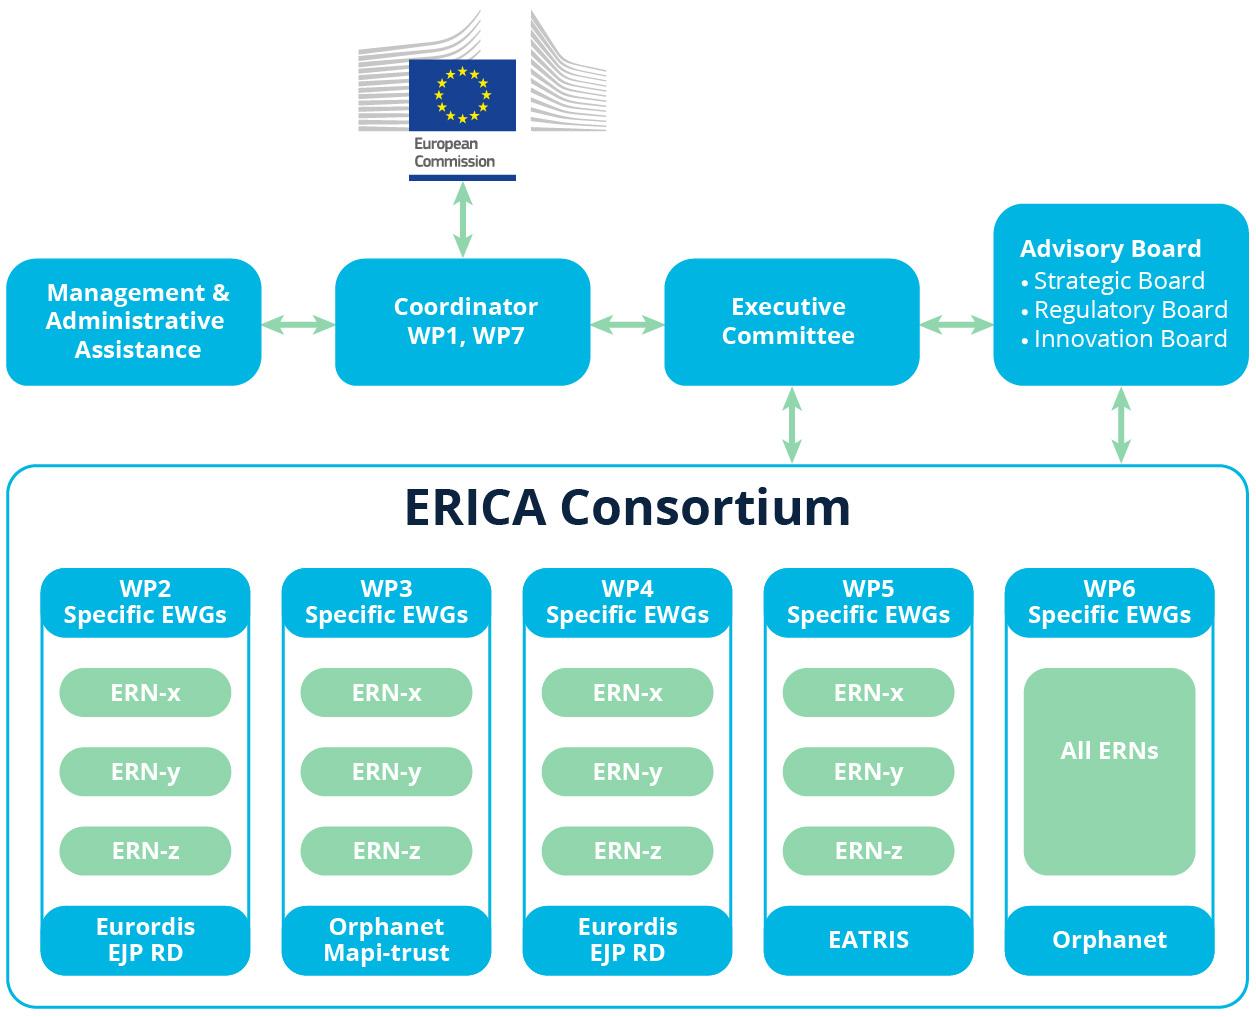 ERICA Governance